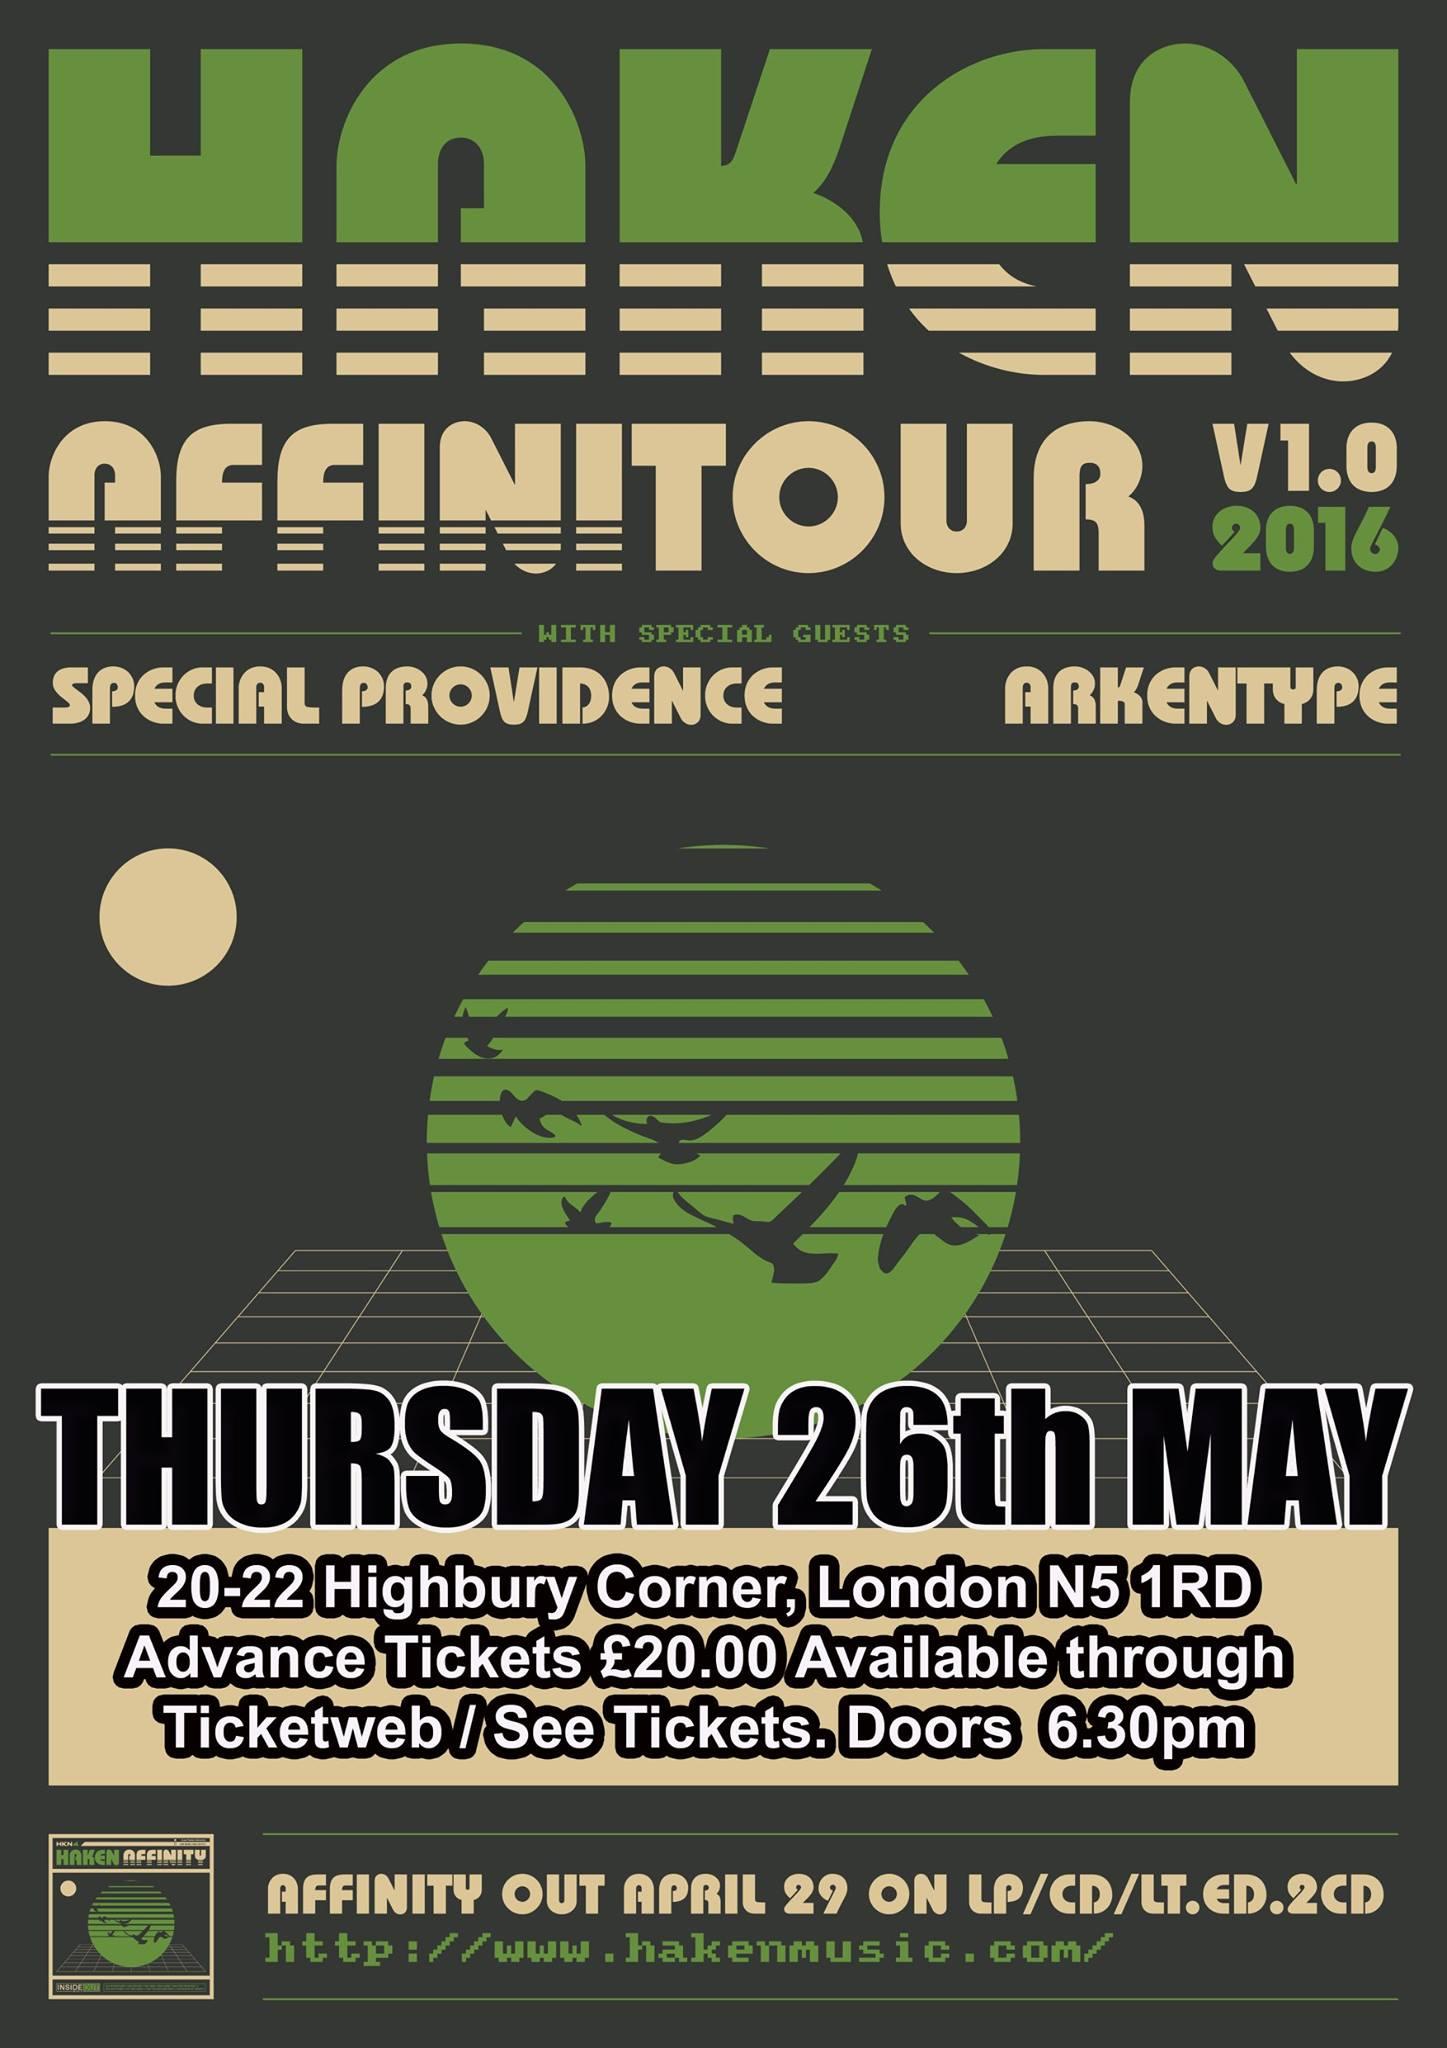 Haken Special Providence Arkentype London Thursday 26th May